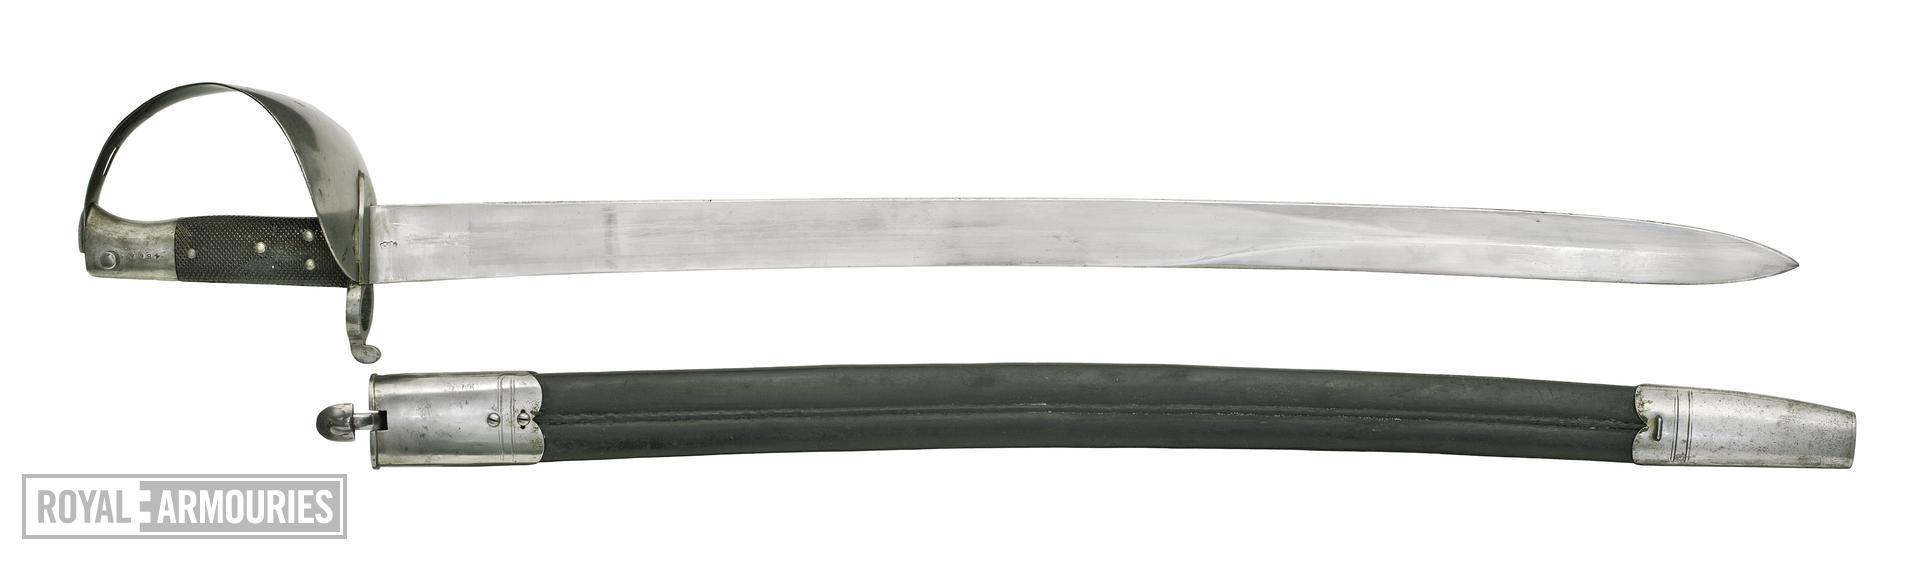 Cutlass Bayonet - Pattern No.3 1859 Naval Model, Verney's catch